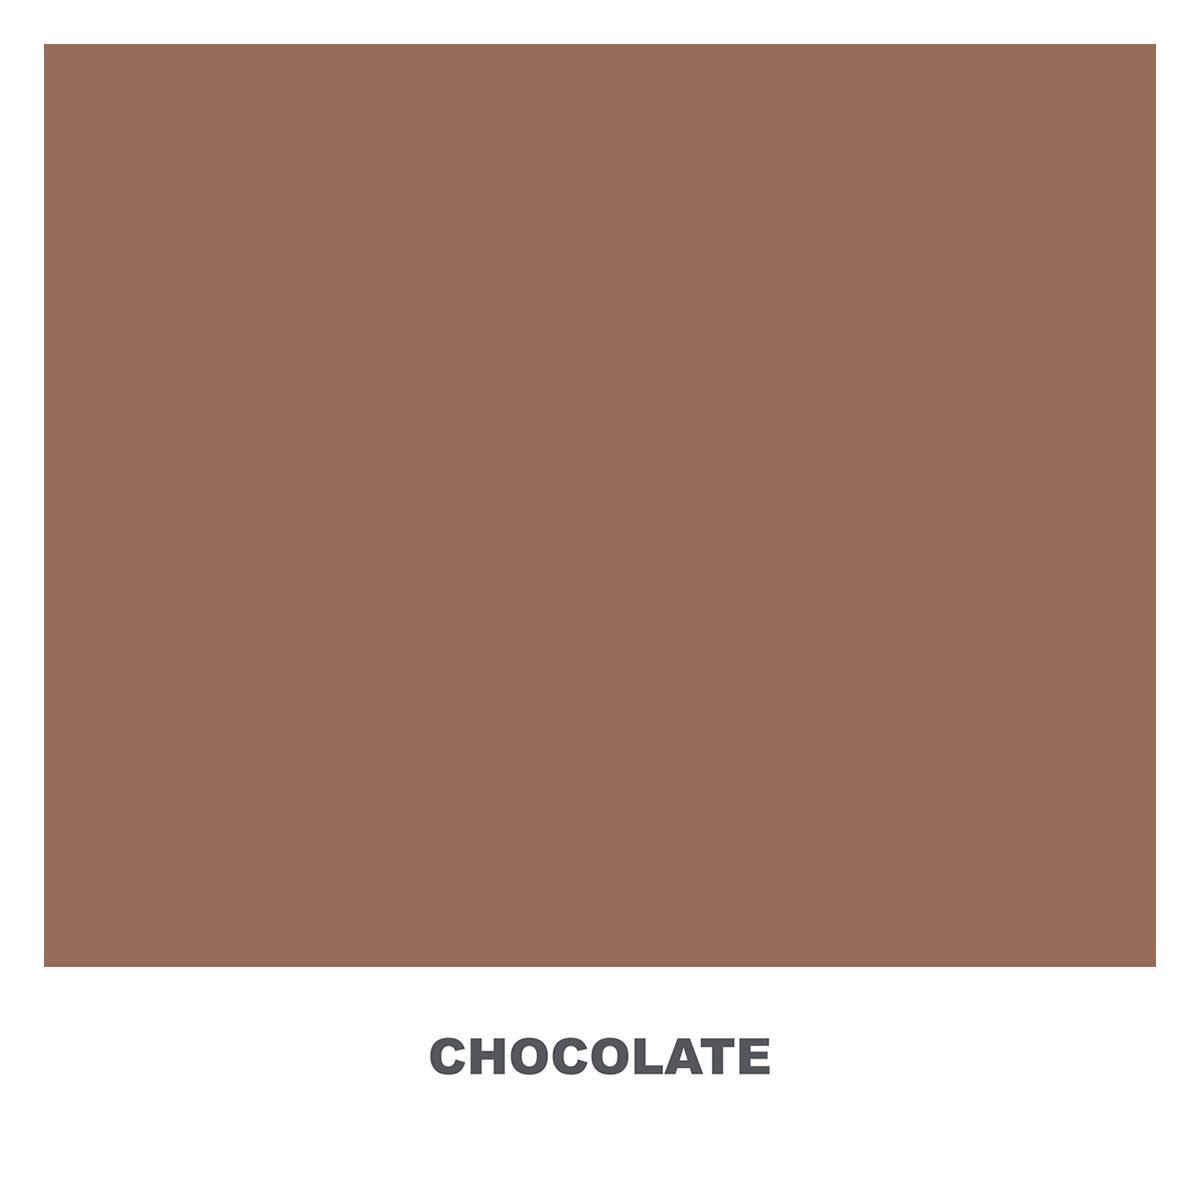 Super Porcelana 1KG - Chocolate